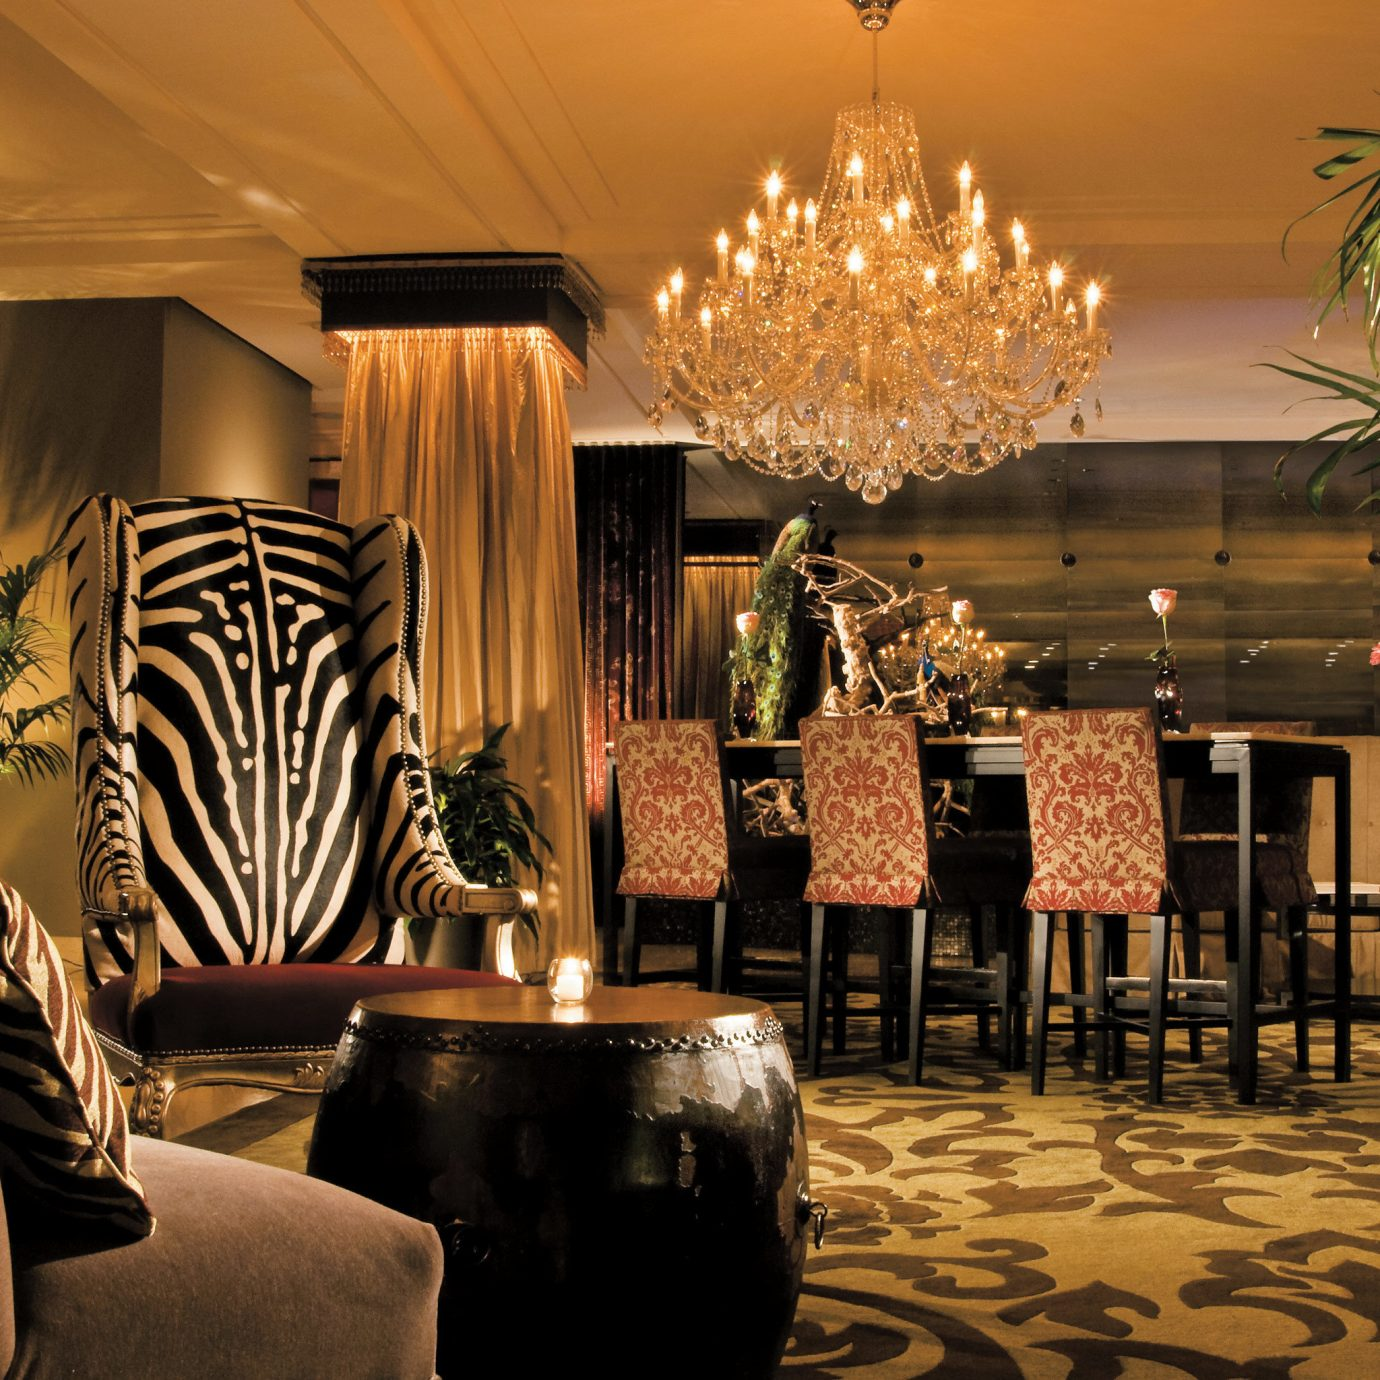 Boutique Elegant Hip Lounge Lobby restaurant function hall ballroom